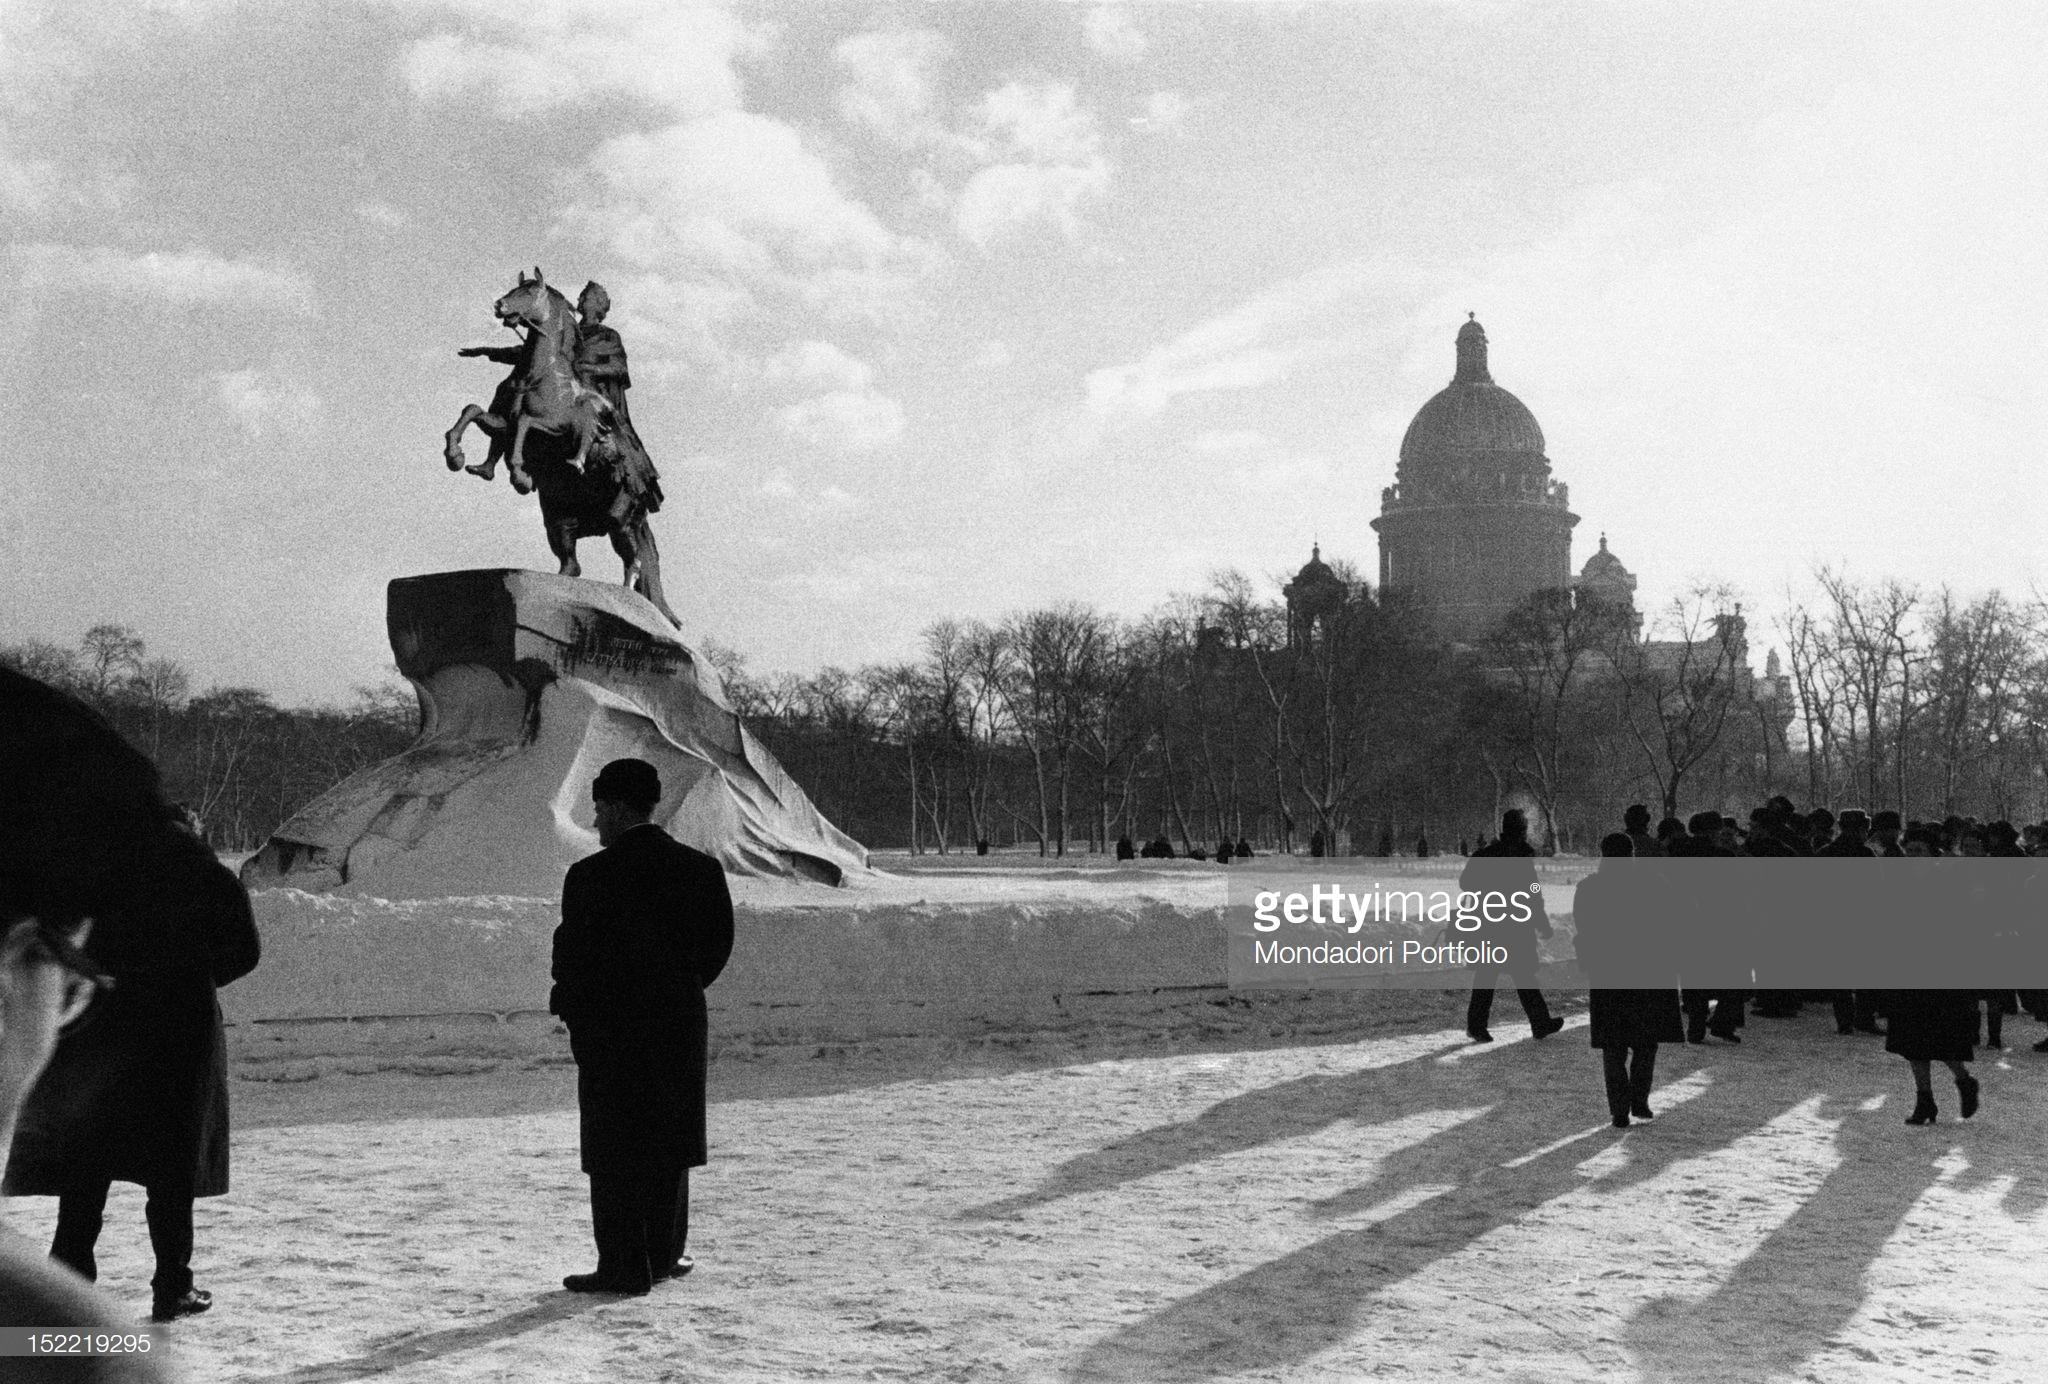 Вид Сенатской площади и памятник Петру I